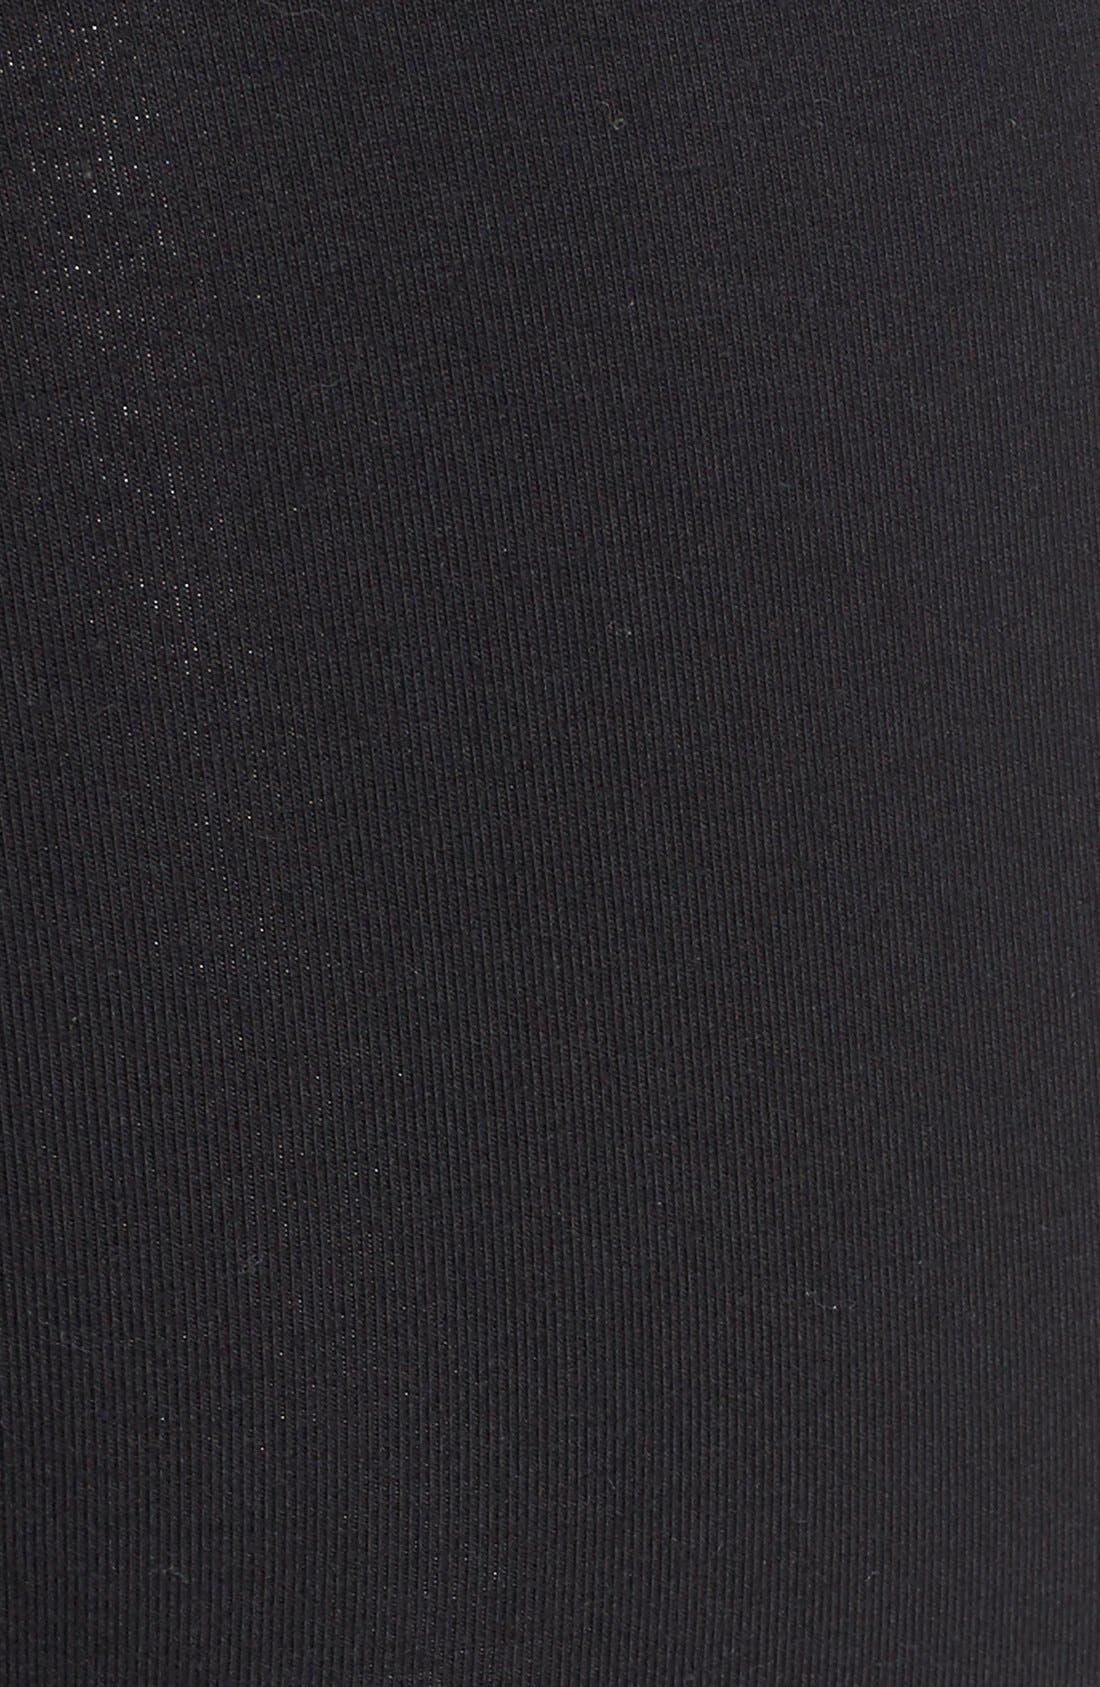 Control Top High Waist Leggings,                             Alternate thumbnail 9, color,                             BLACK